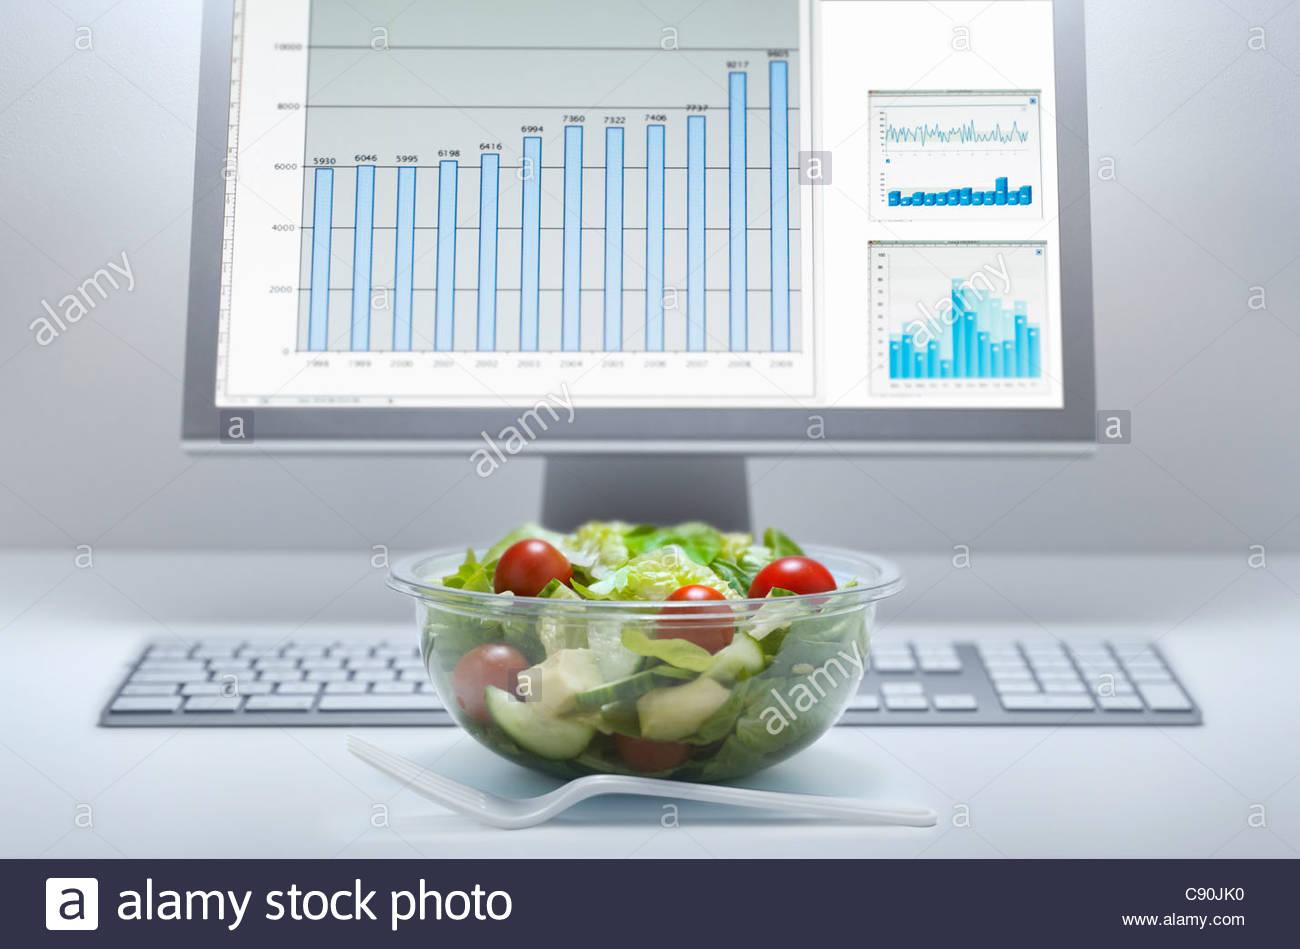 Bowl of salad at computer desk - Stock Image